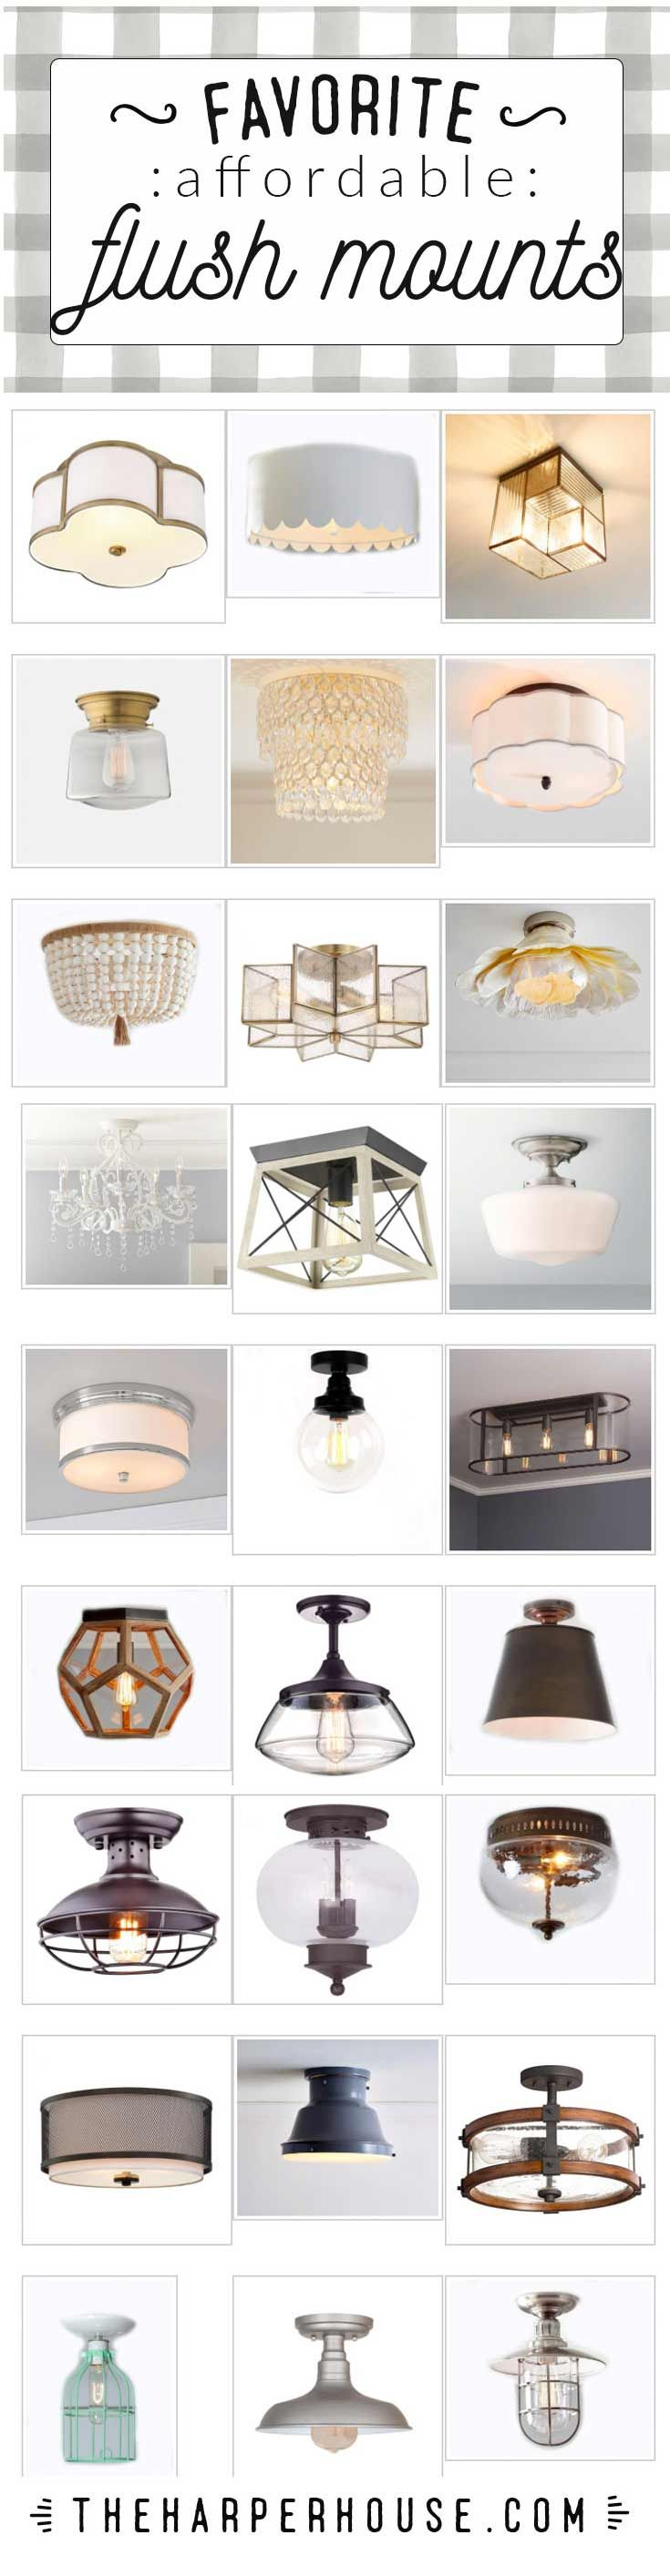 645 best lighting images on Pinterest | Chandelier, Chandelier ...